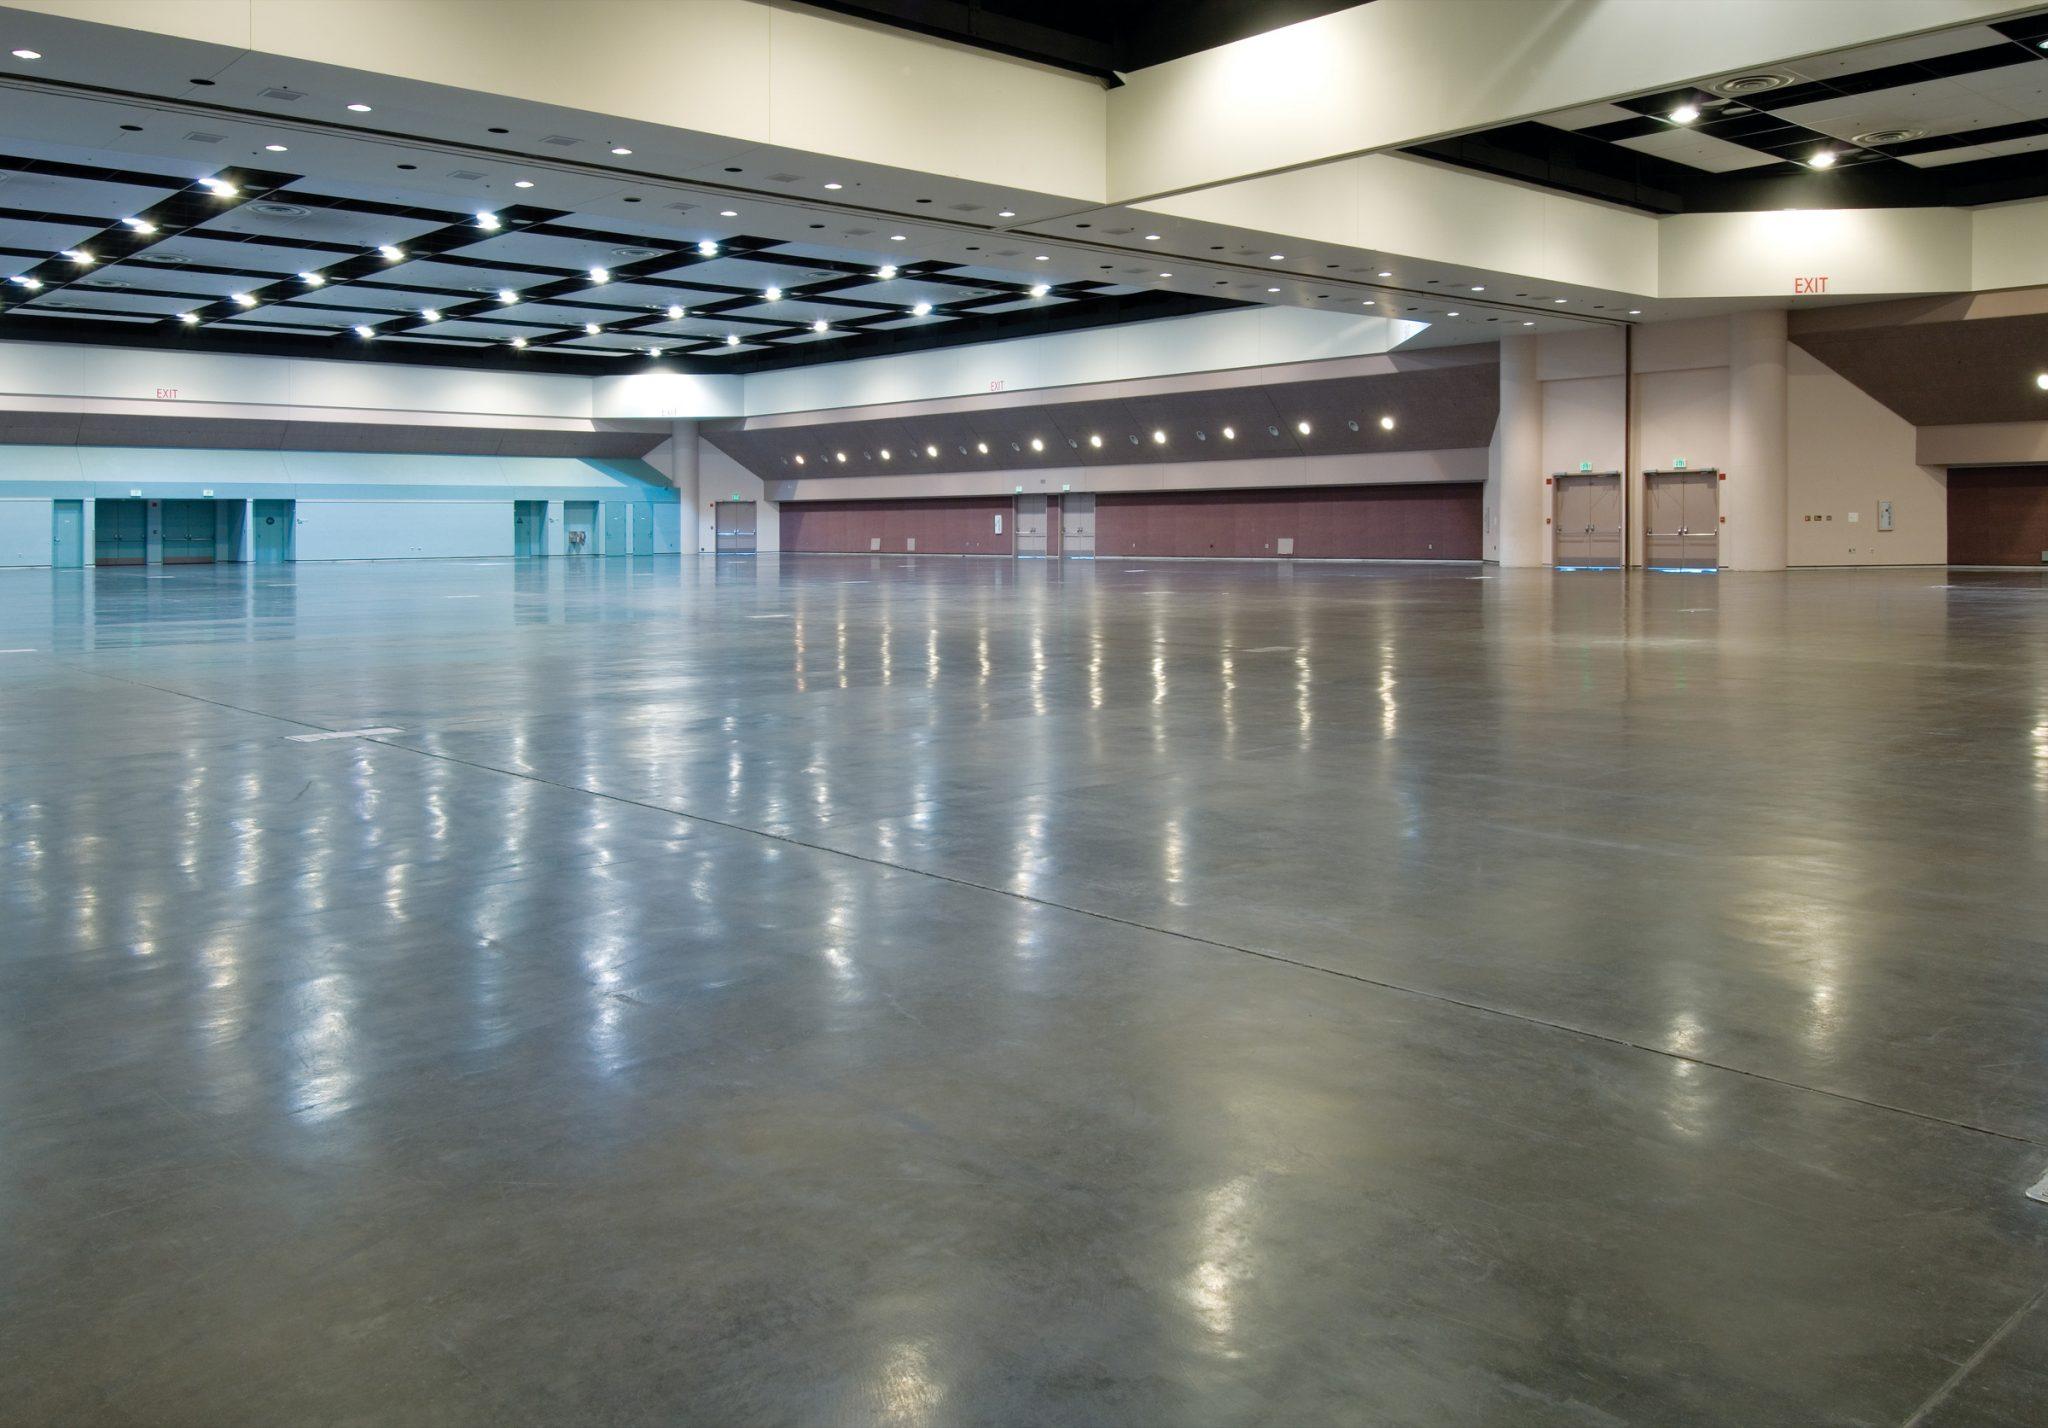 Santa Clara Convention Center Image 4 - Visit Santa Clara, Ca For San Jose Convention Calender